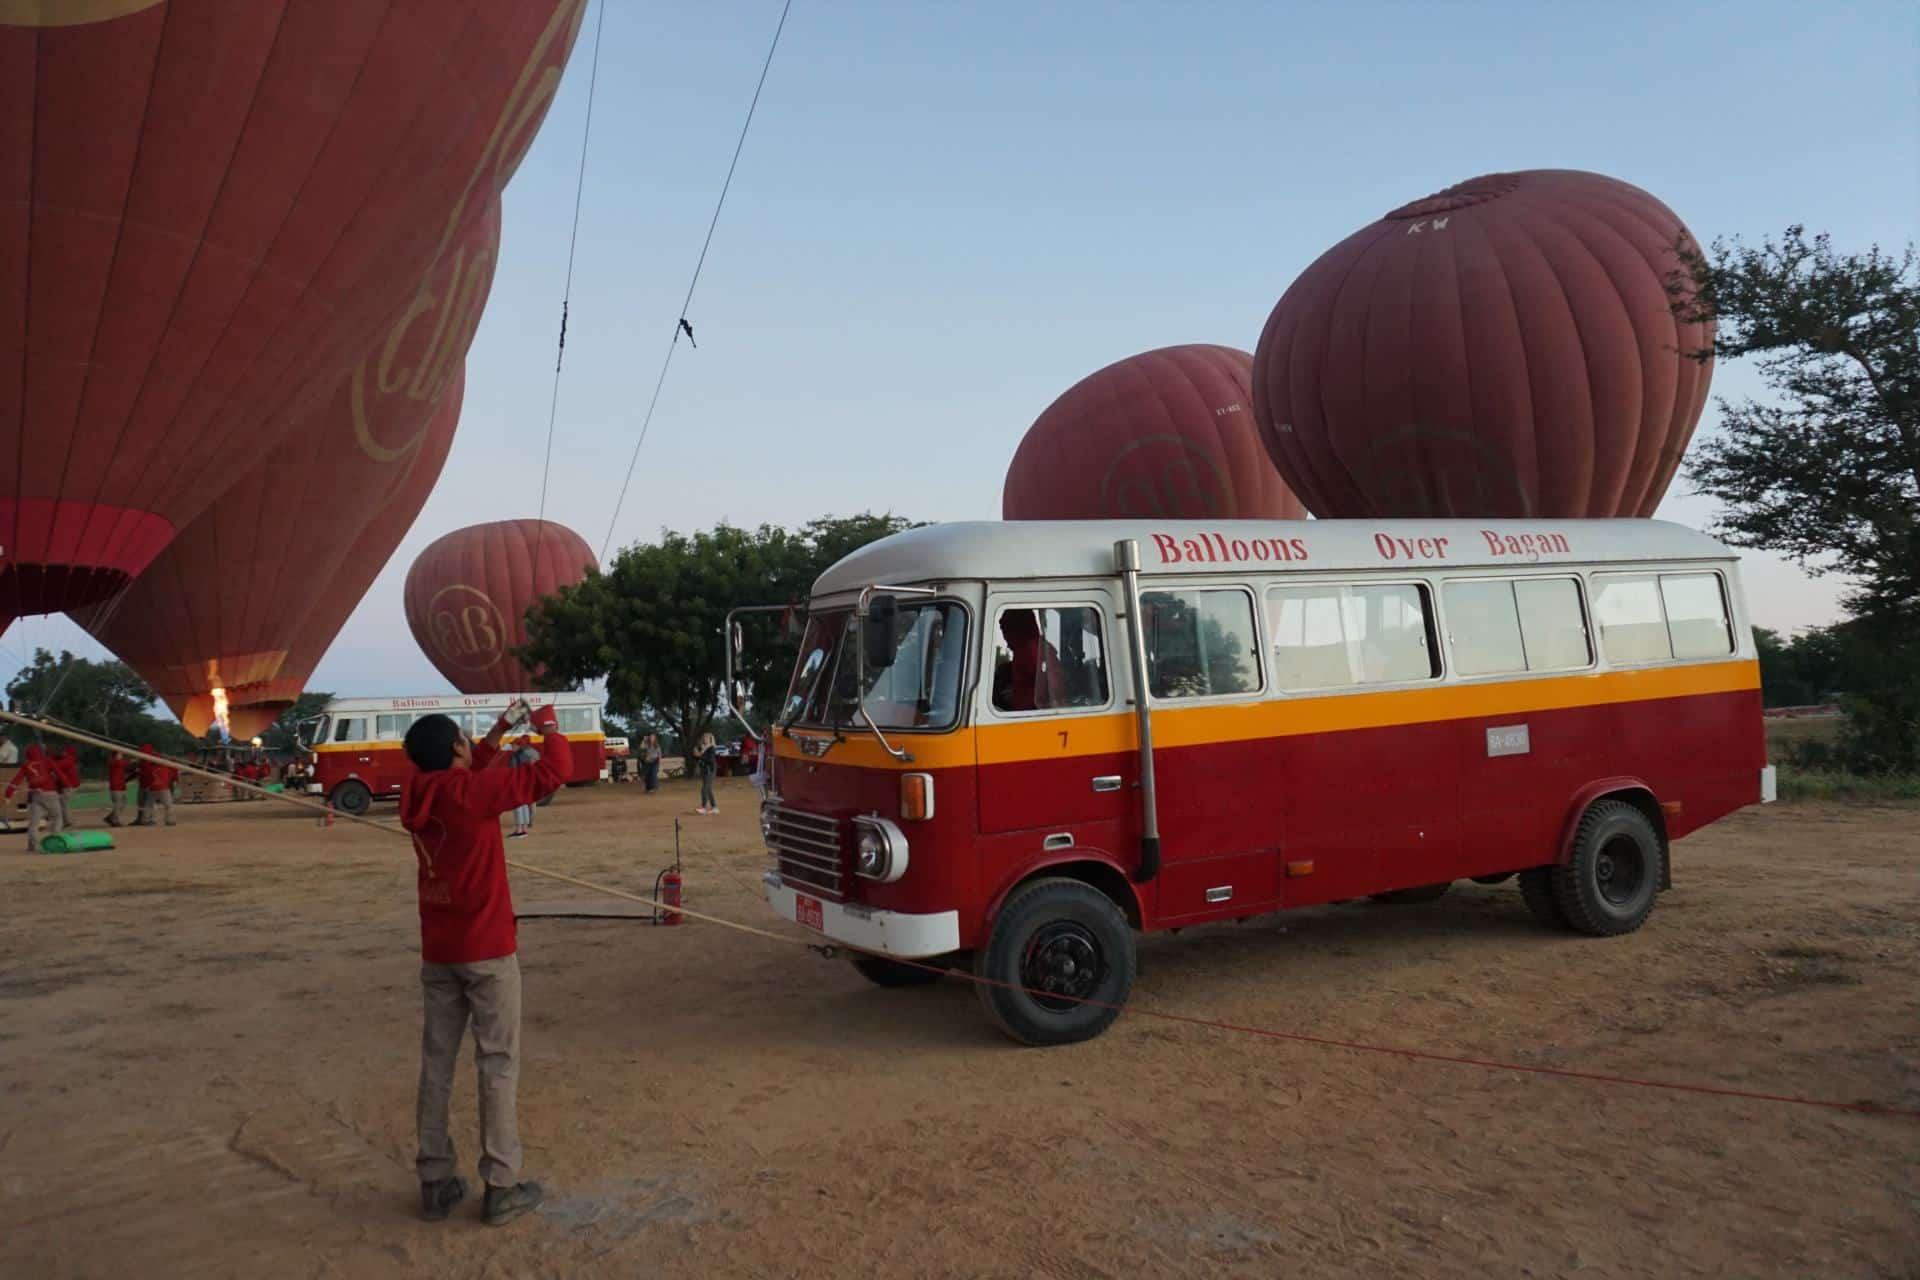 Oldtimerbus Balloons over Bagan